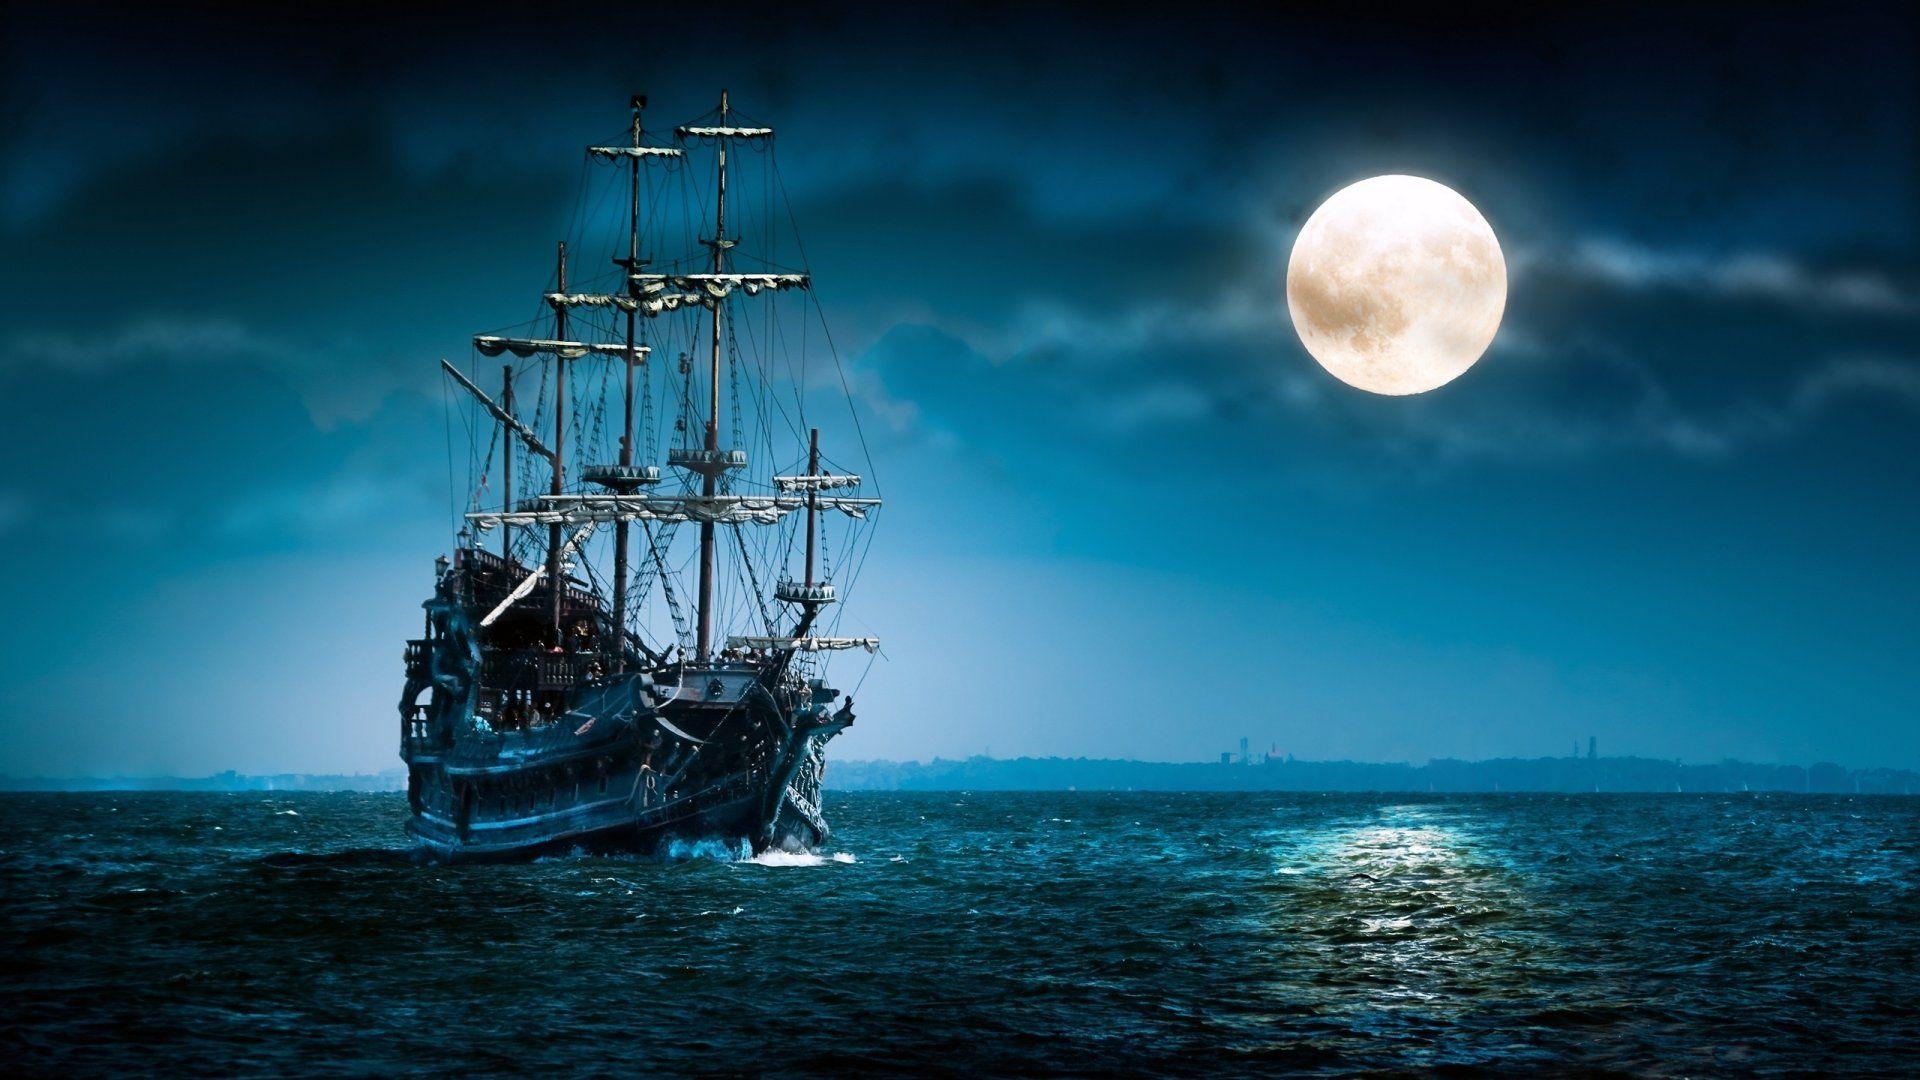 Sailboat Sea Moon Ship Boat Ocean Night Mood Wallpapers Hd